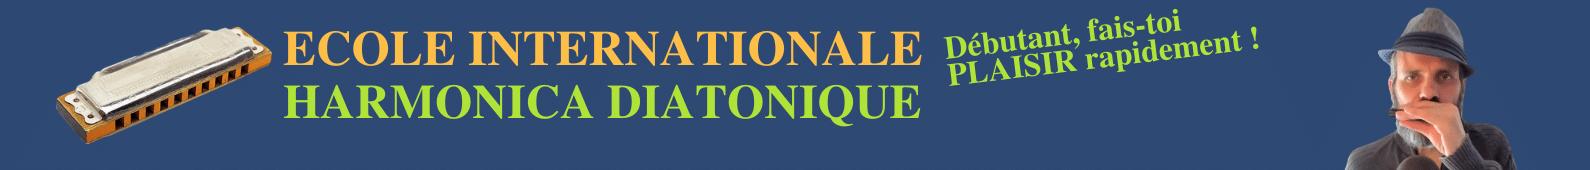 Ecole Internationale Harmonica Diatonique (3)